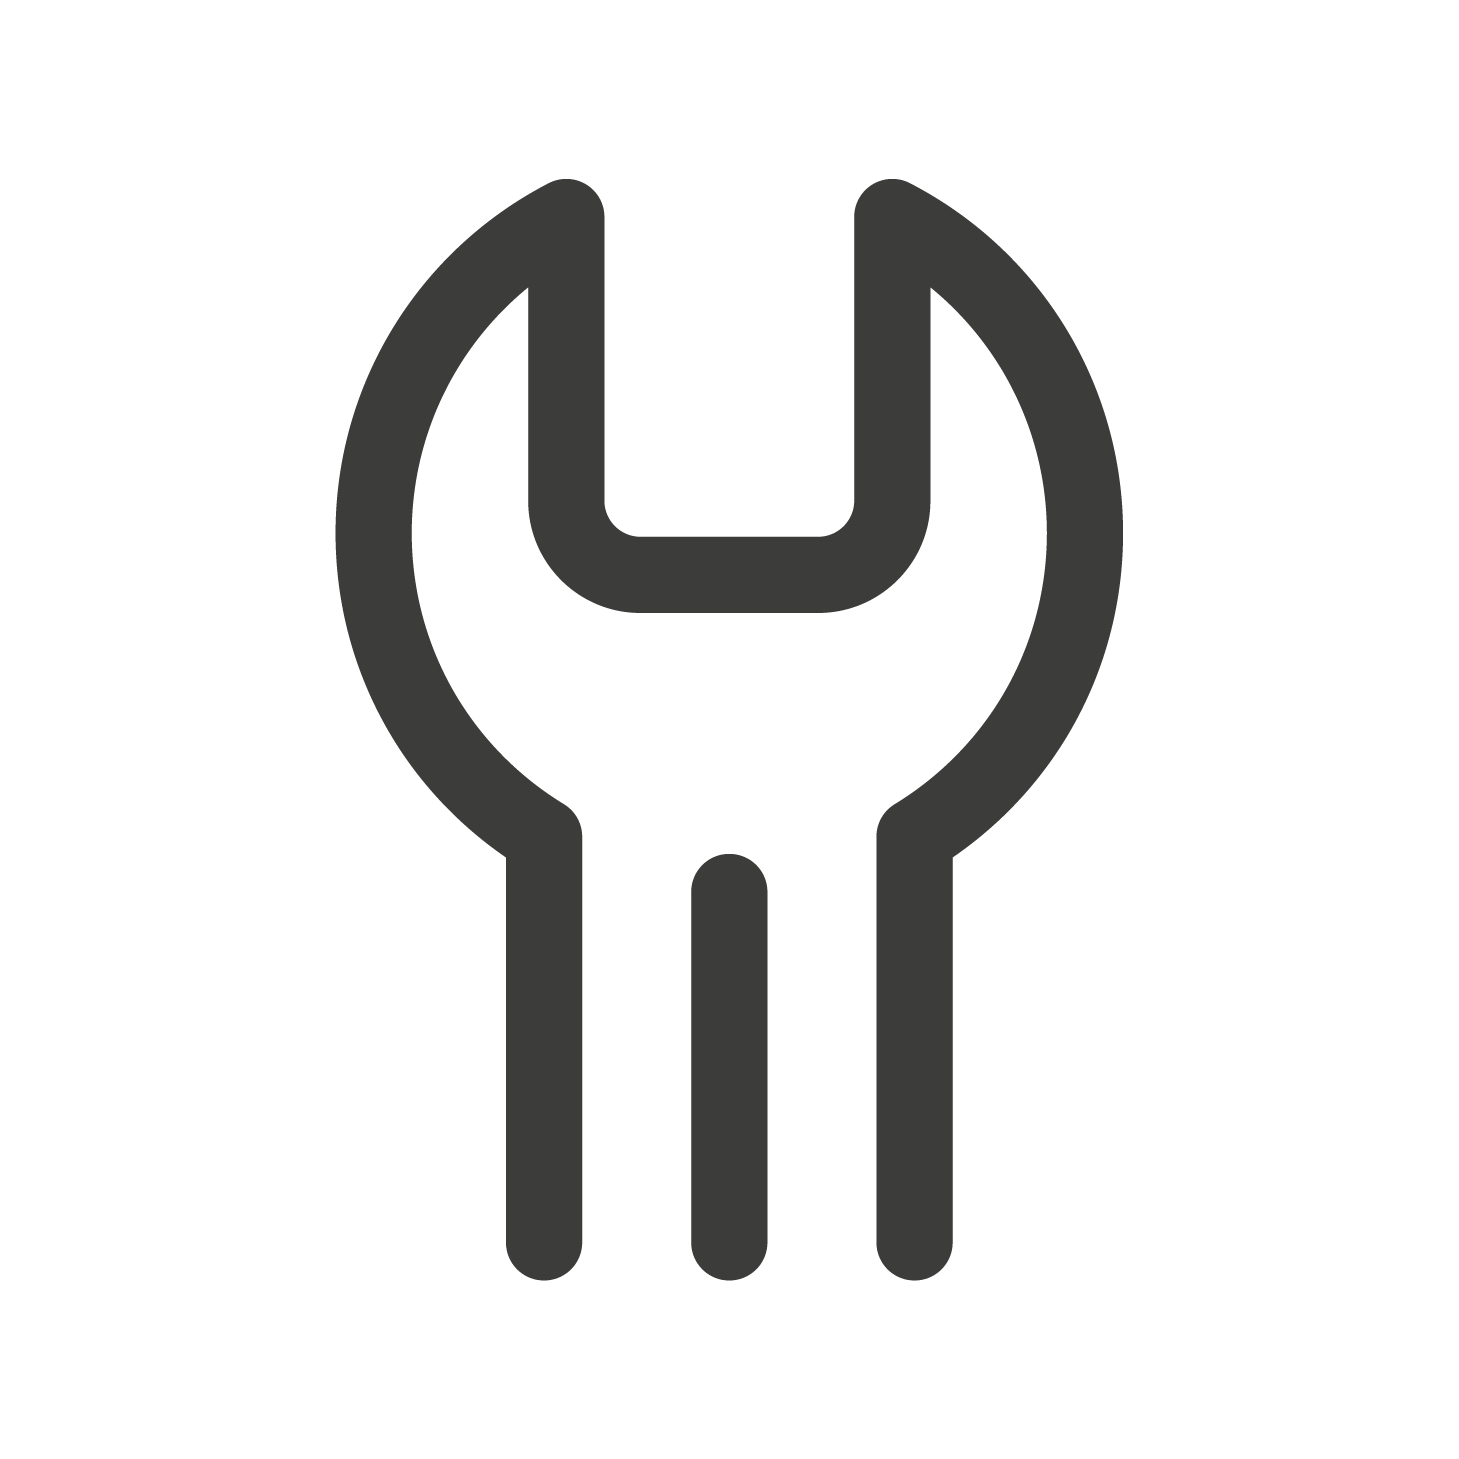 Zange Icon